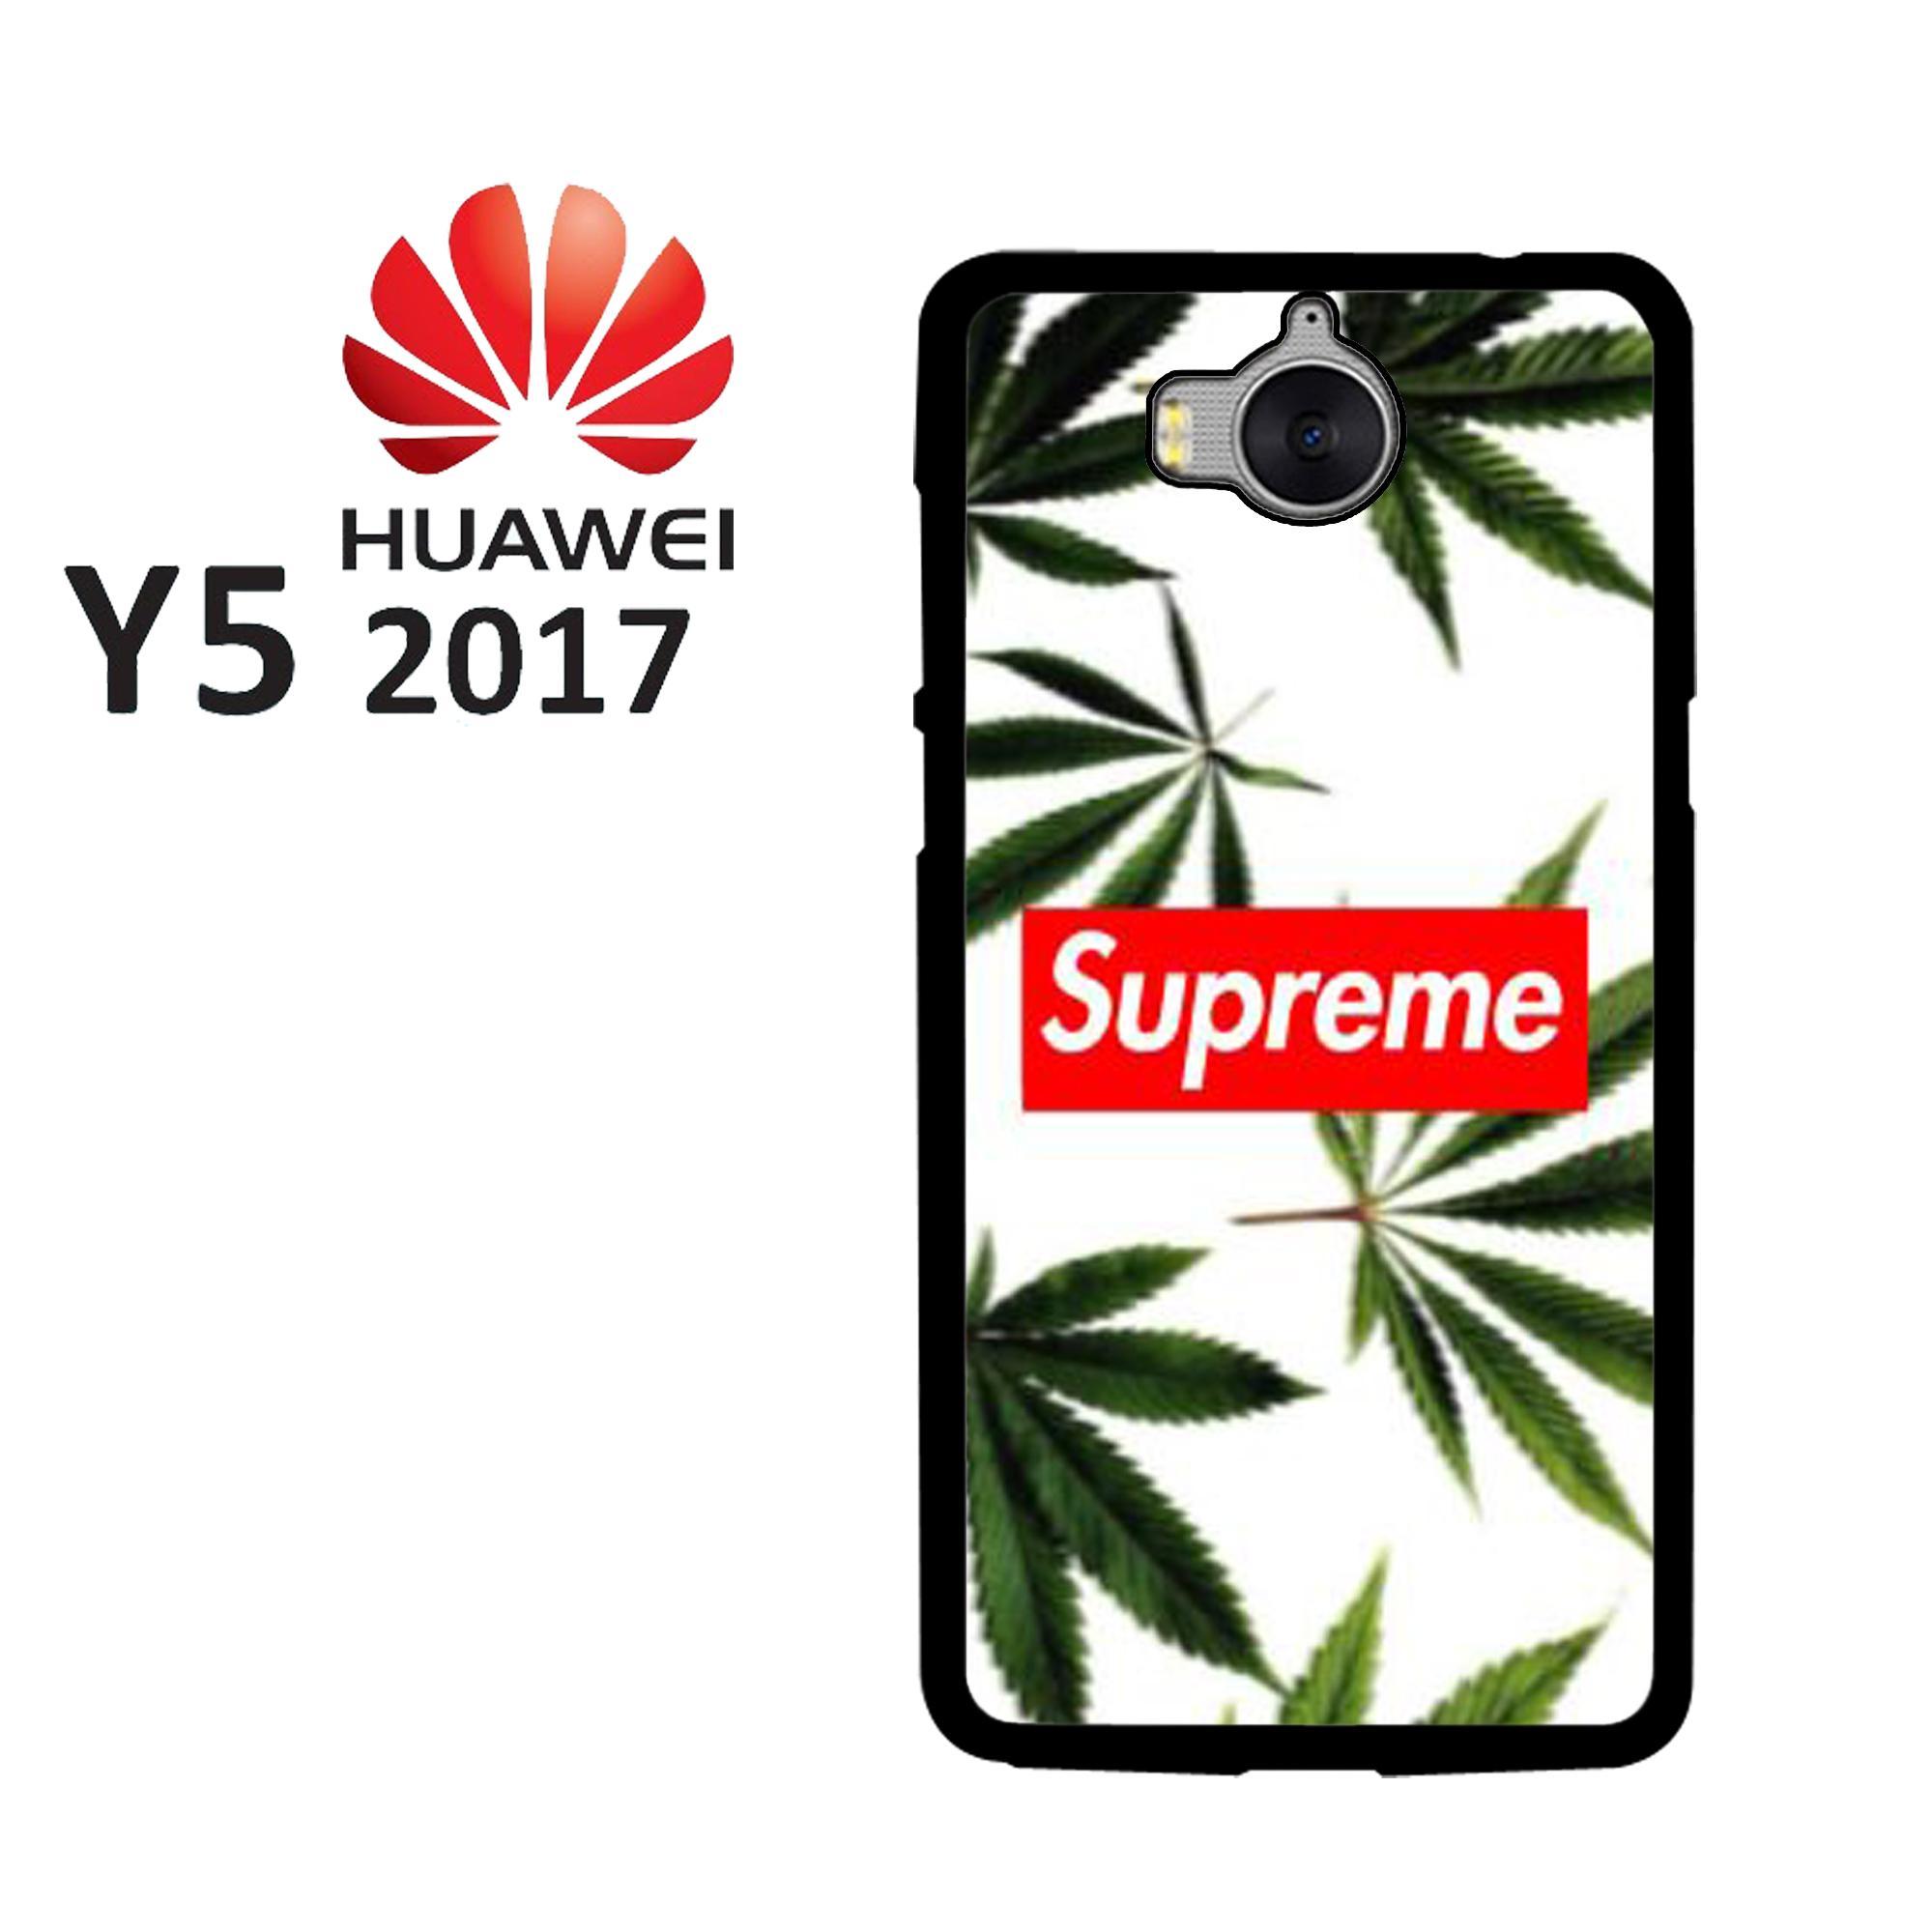 Handuk Rosanna Printing Panel 72x145 Doraemon Update Daftar Harga Manchester Intristore Fashion Case Huawei Y5 2017 15